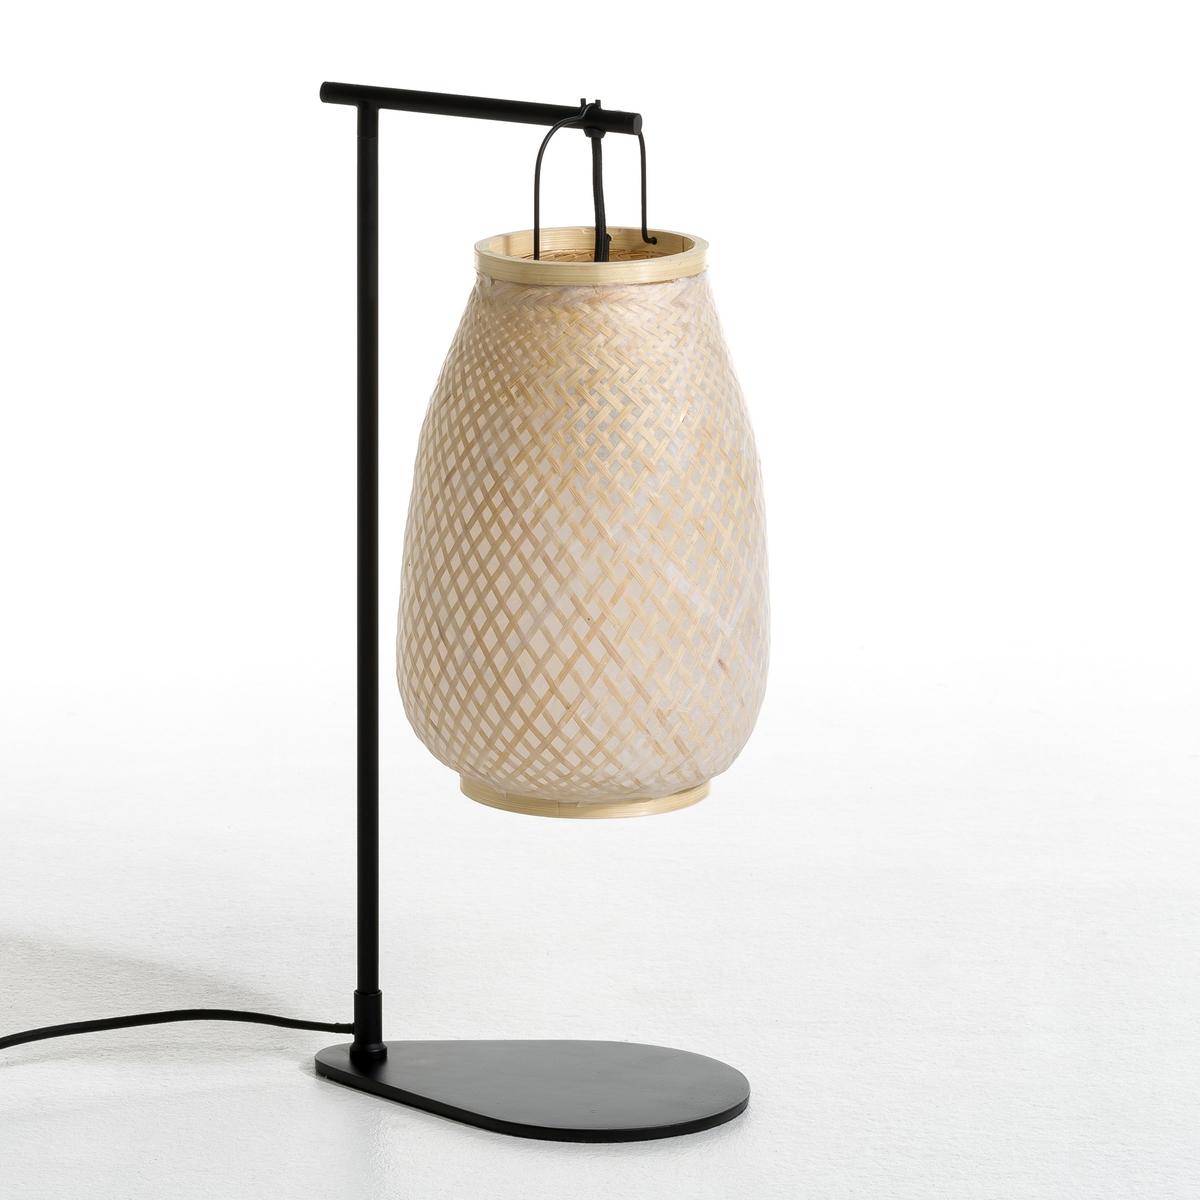 Лампа настольная Titouan, дизайн Э. Галлины от La Redoute